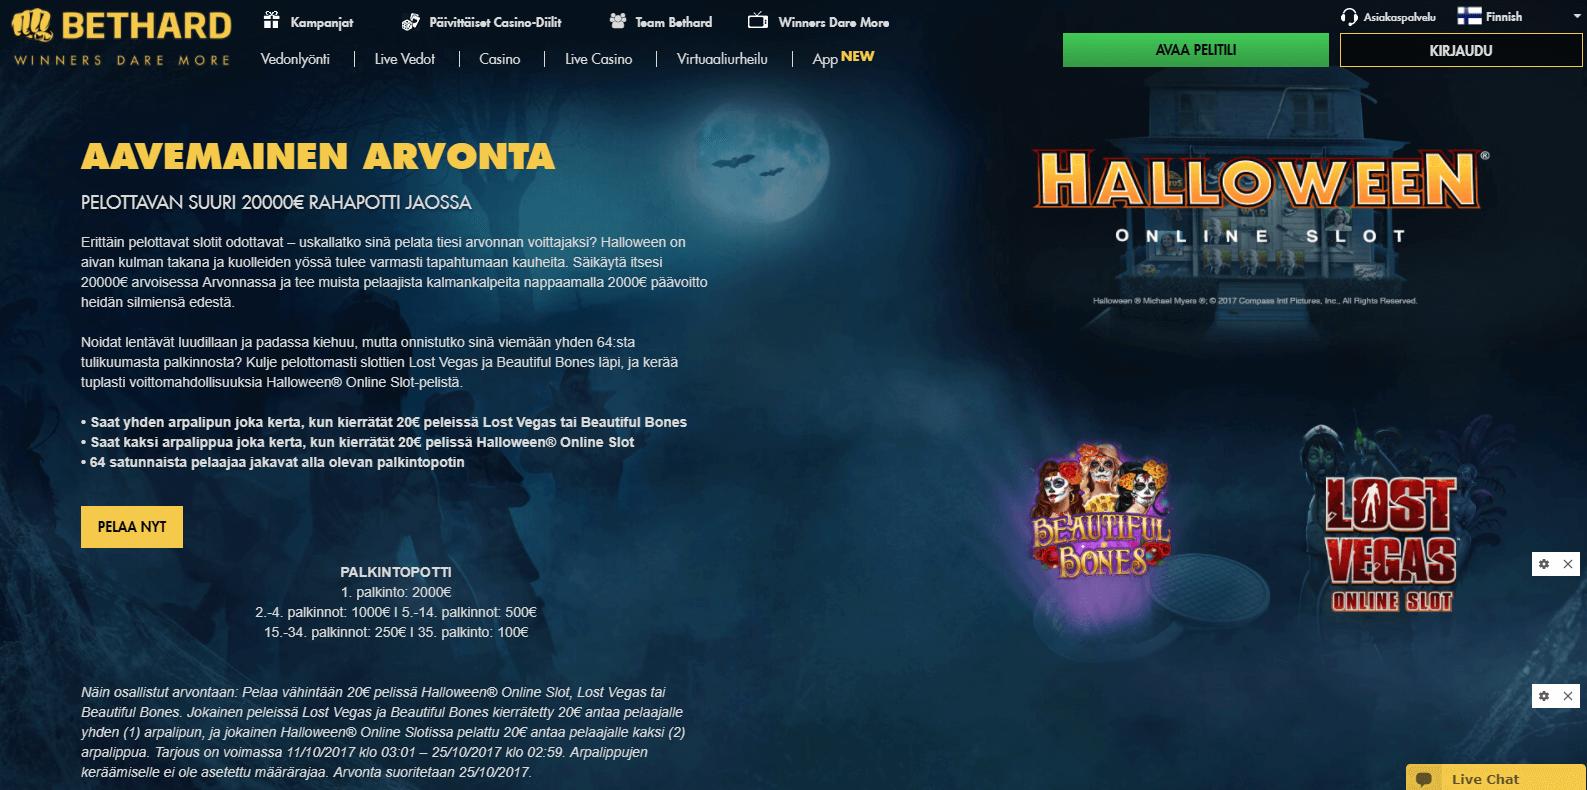 Bethard halloween arvonta